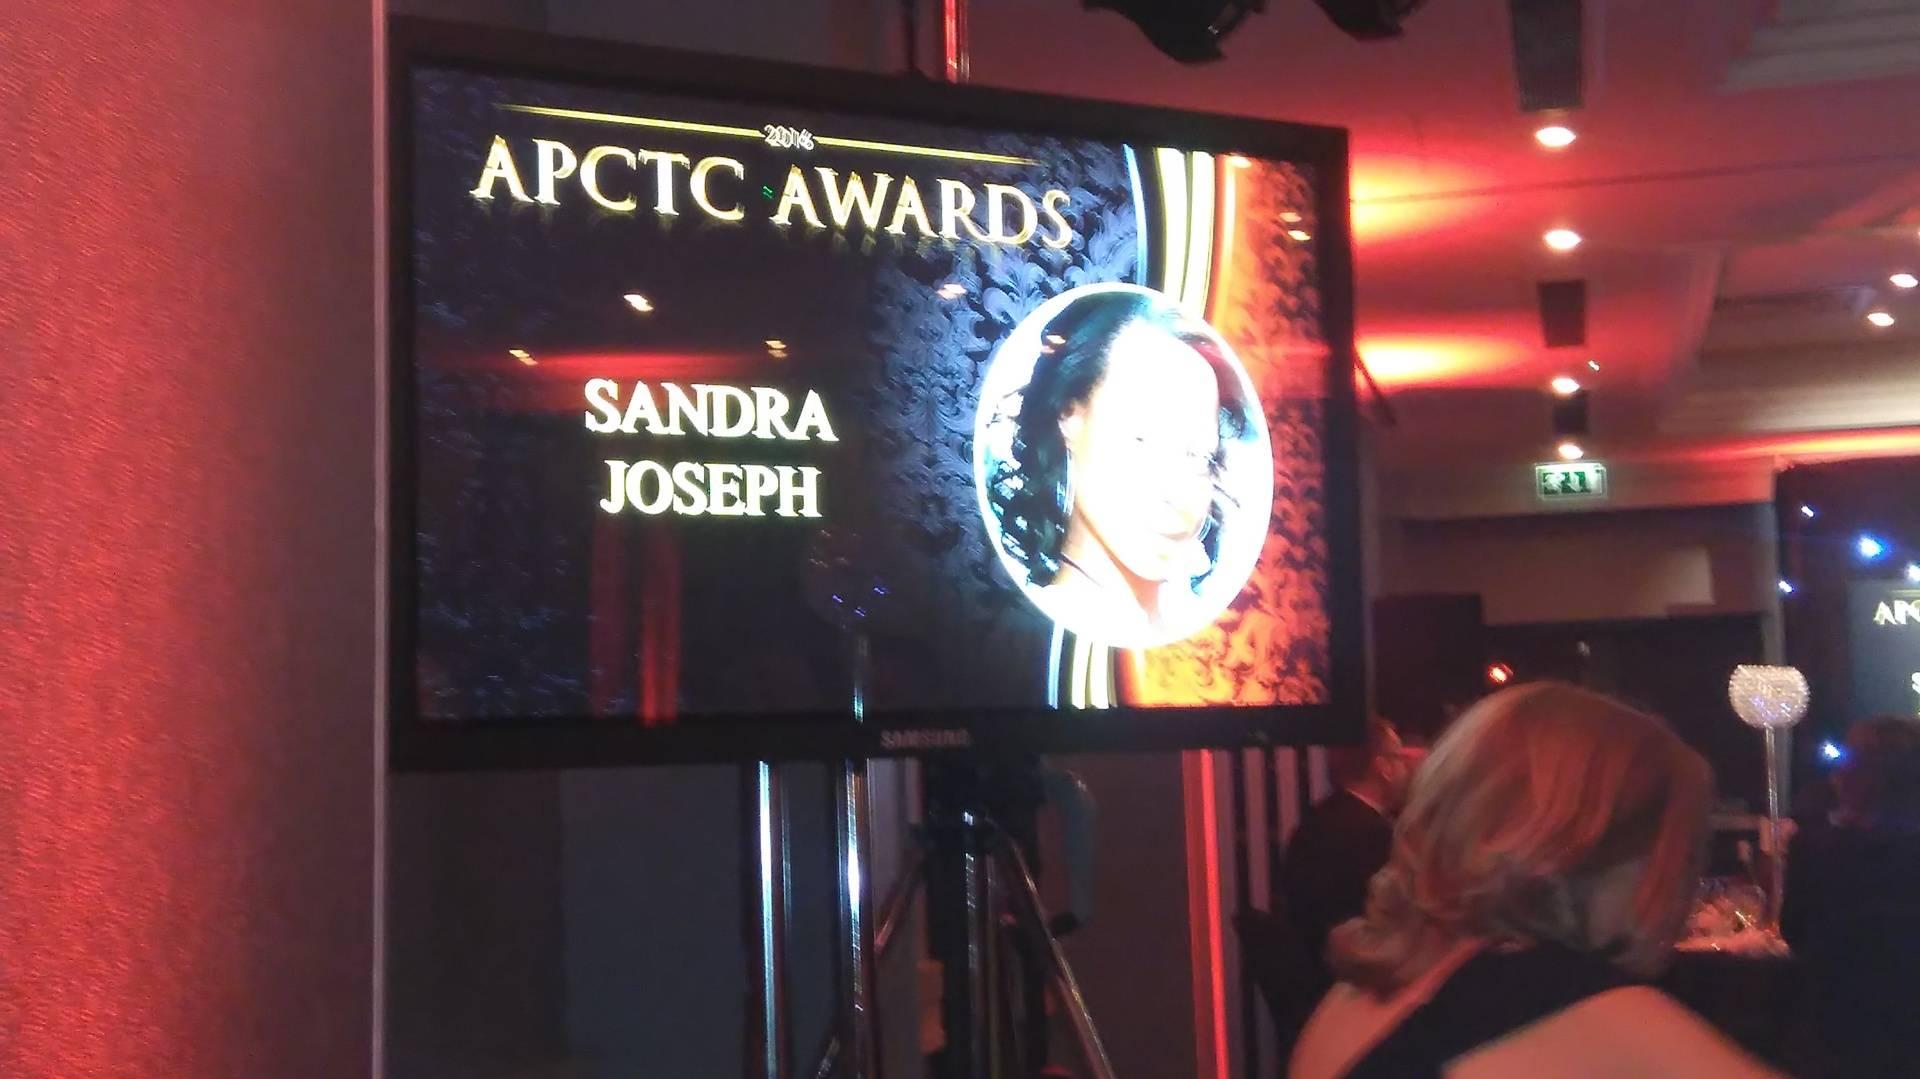 APCTC AWARDS 26/11/16